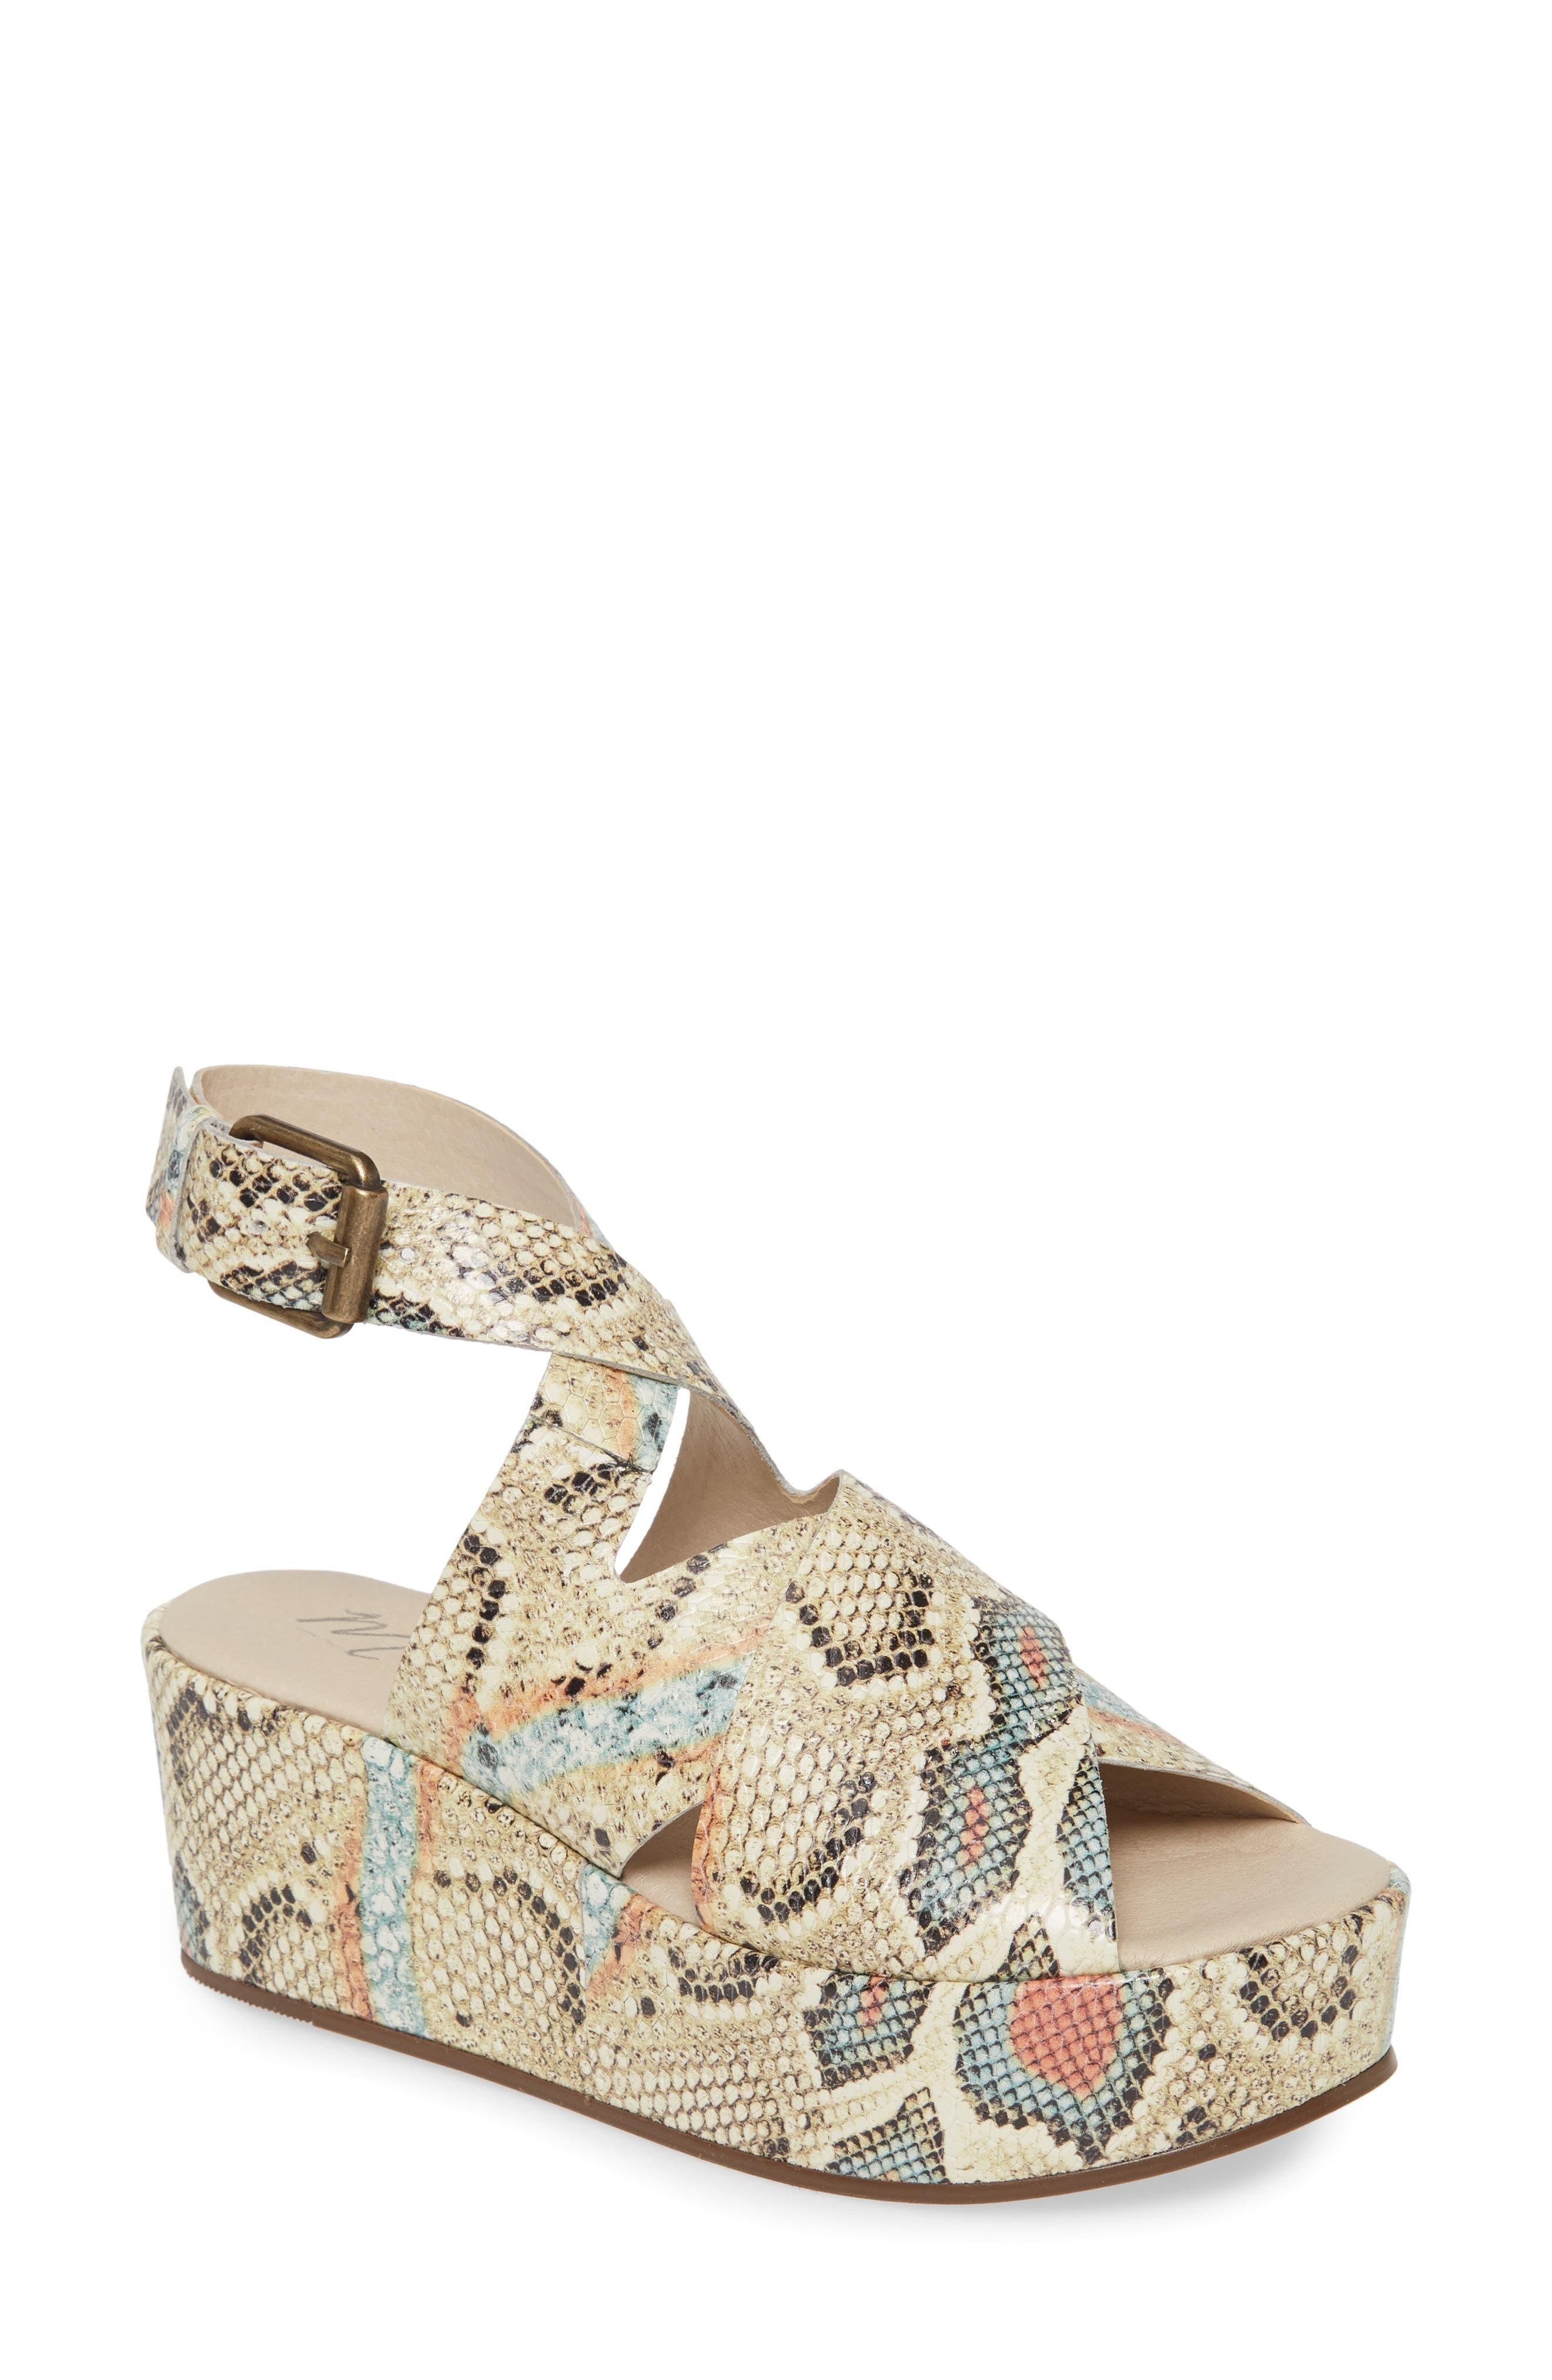 Runaway Wedge Sandal